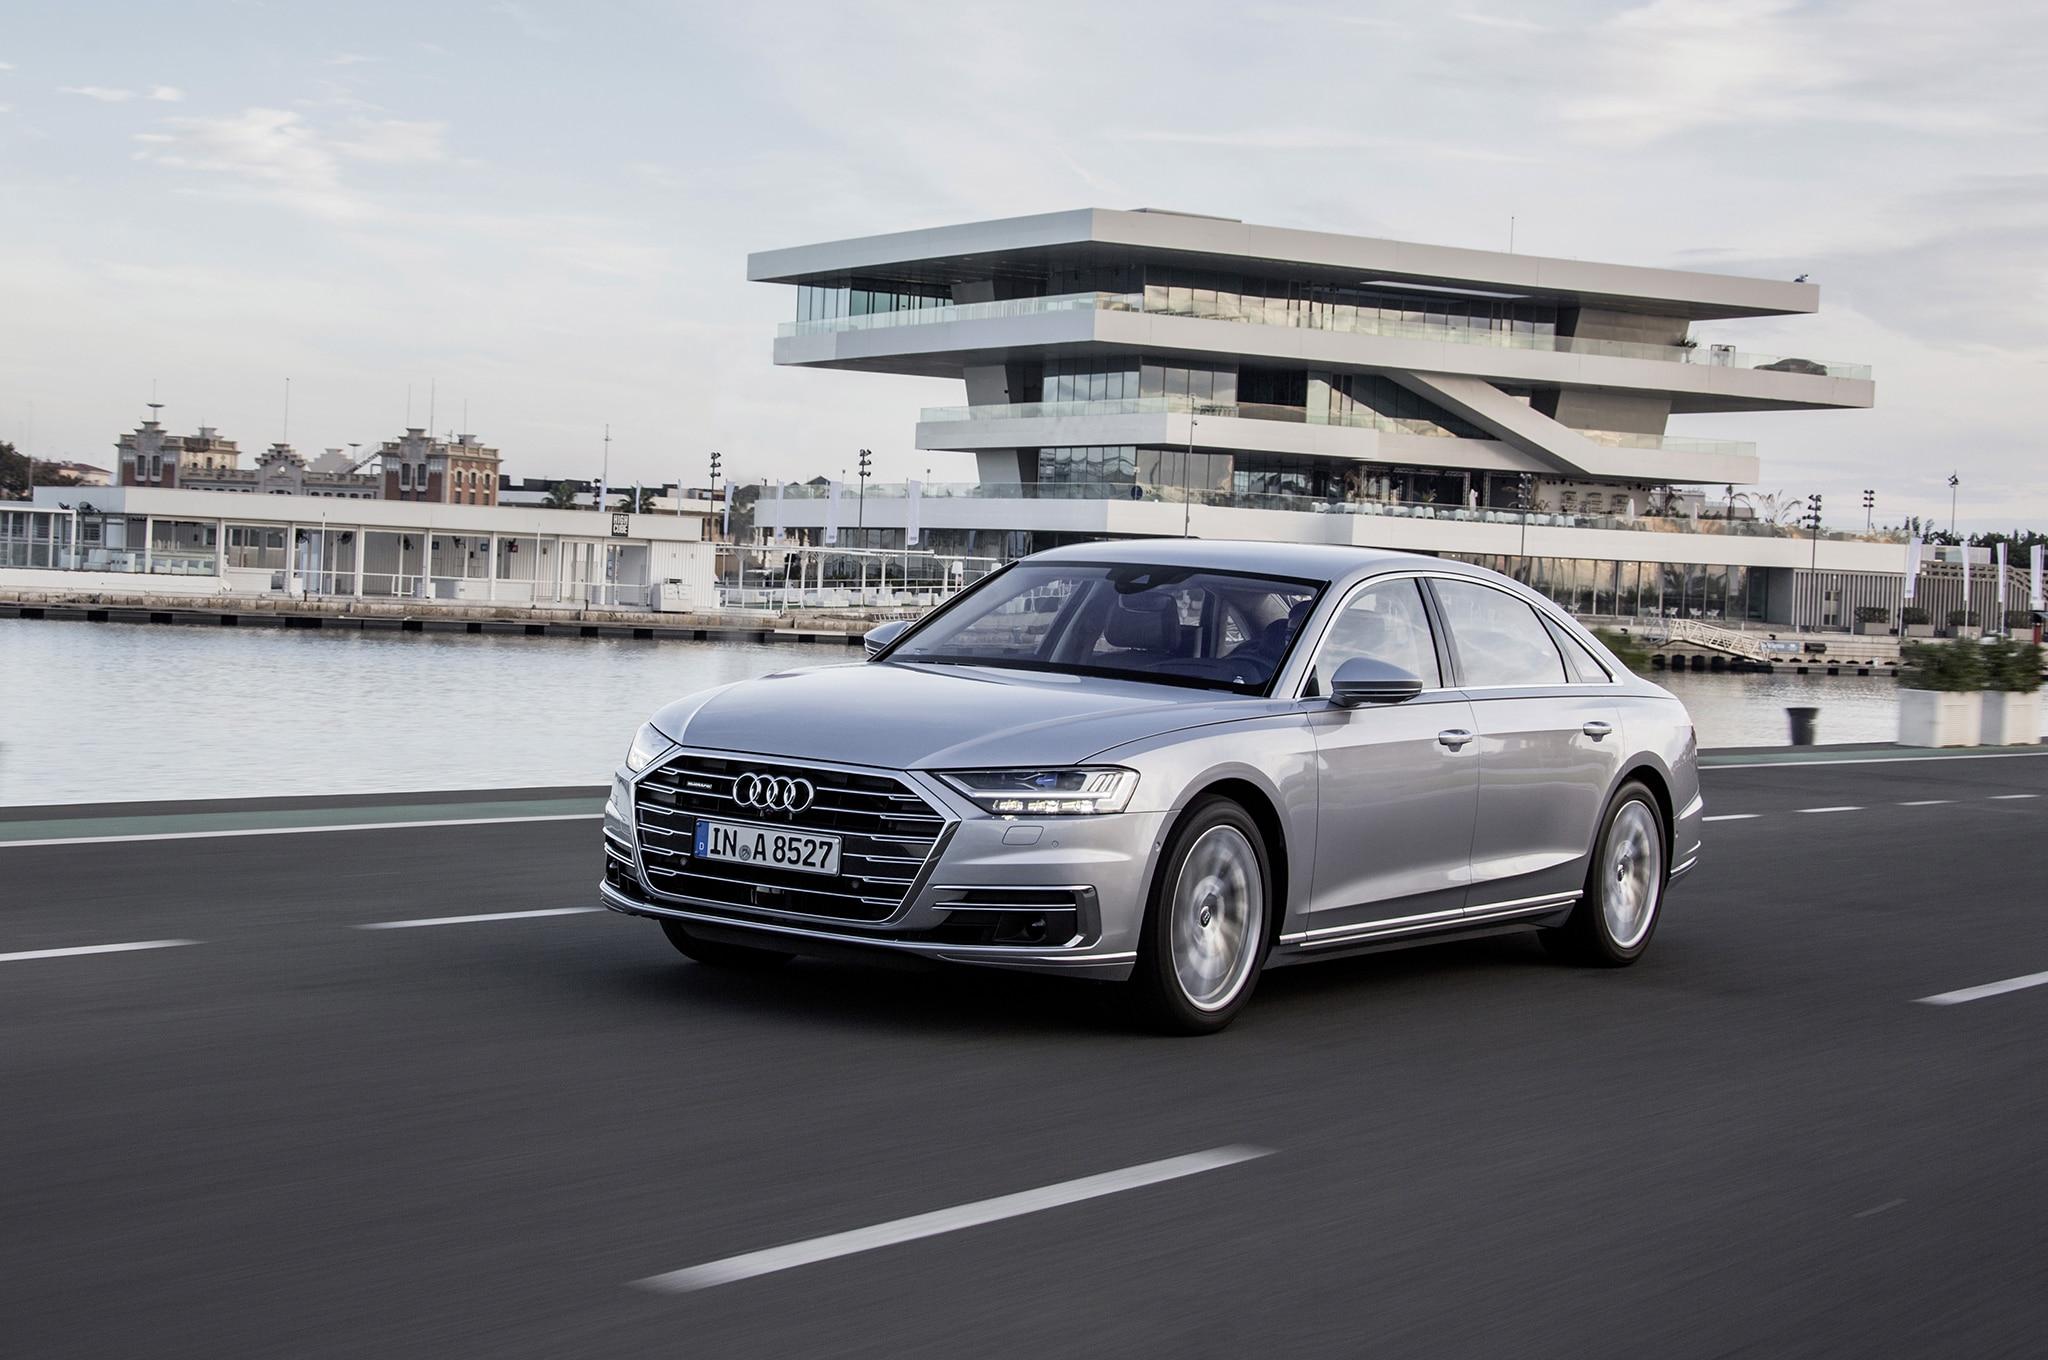 First Drive: 2019 Audi A8L | Automobile Magazine